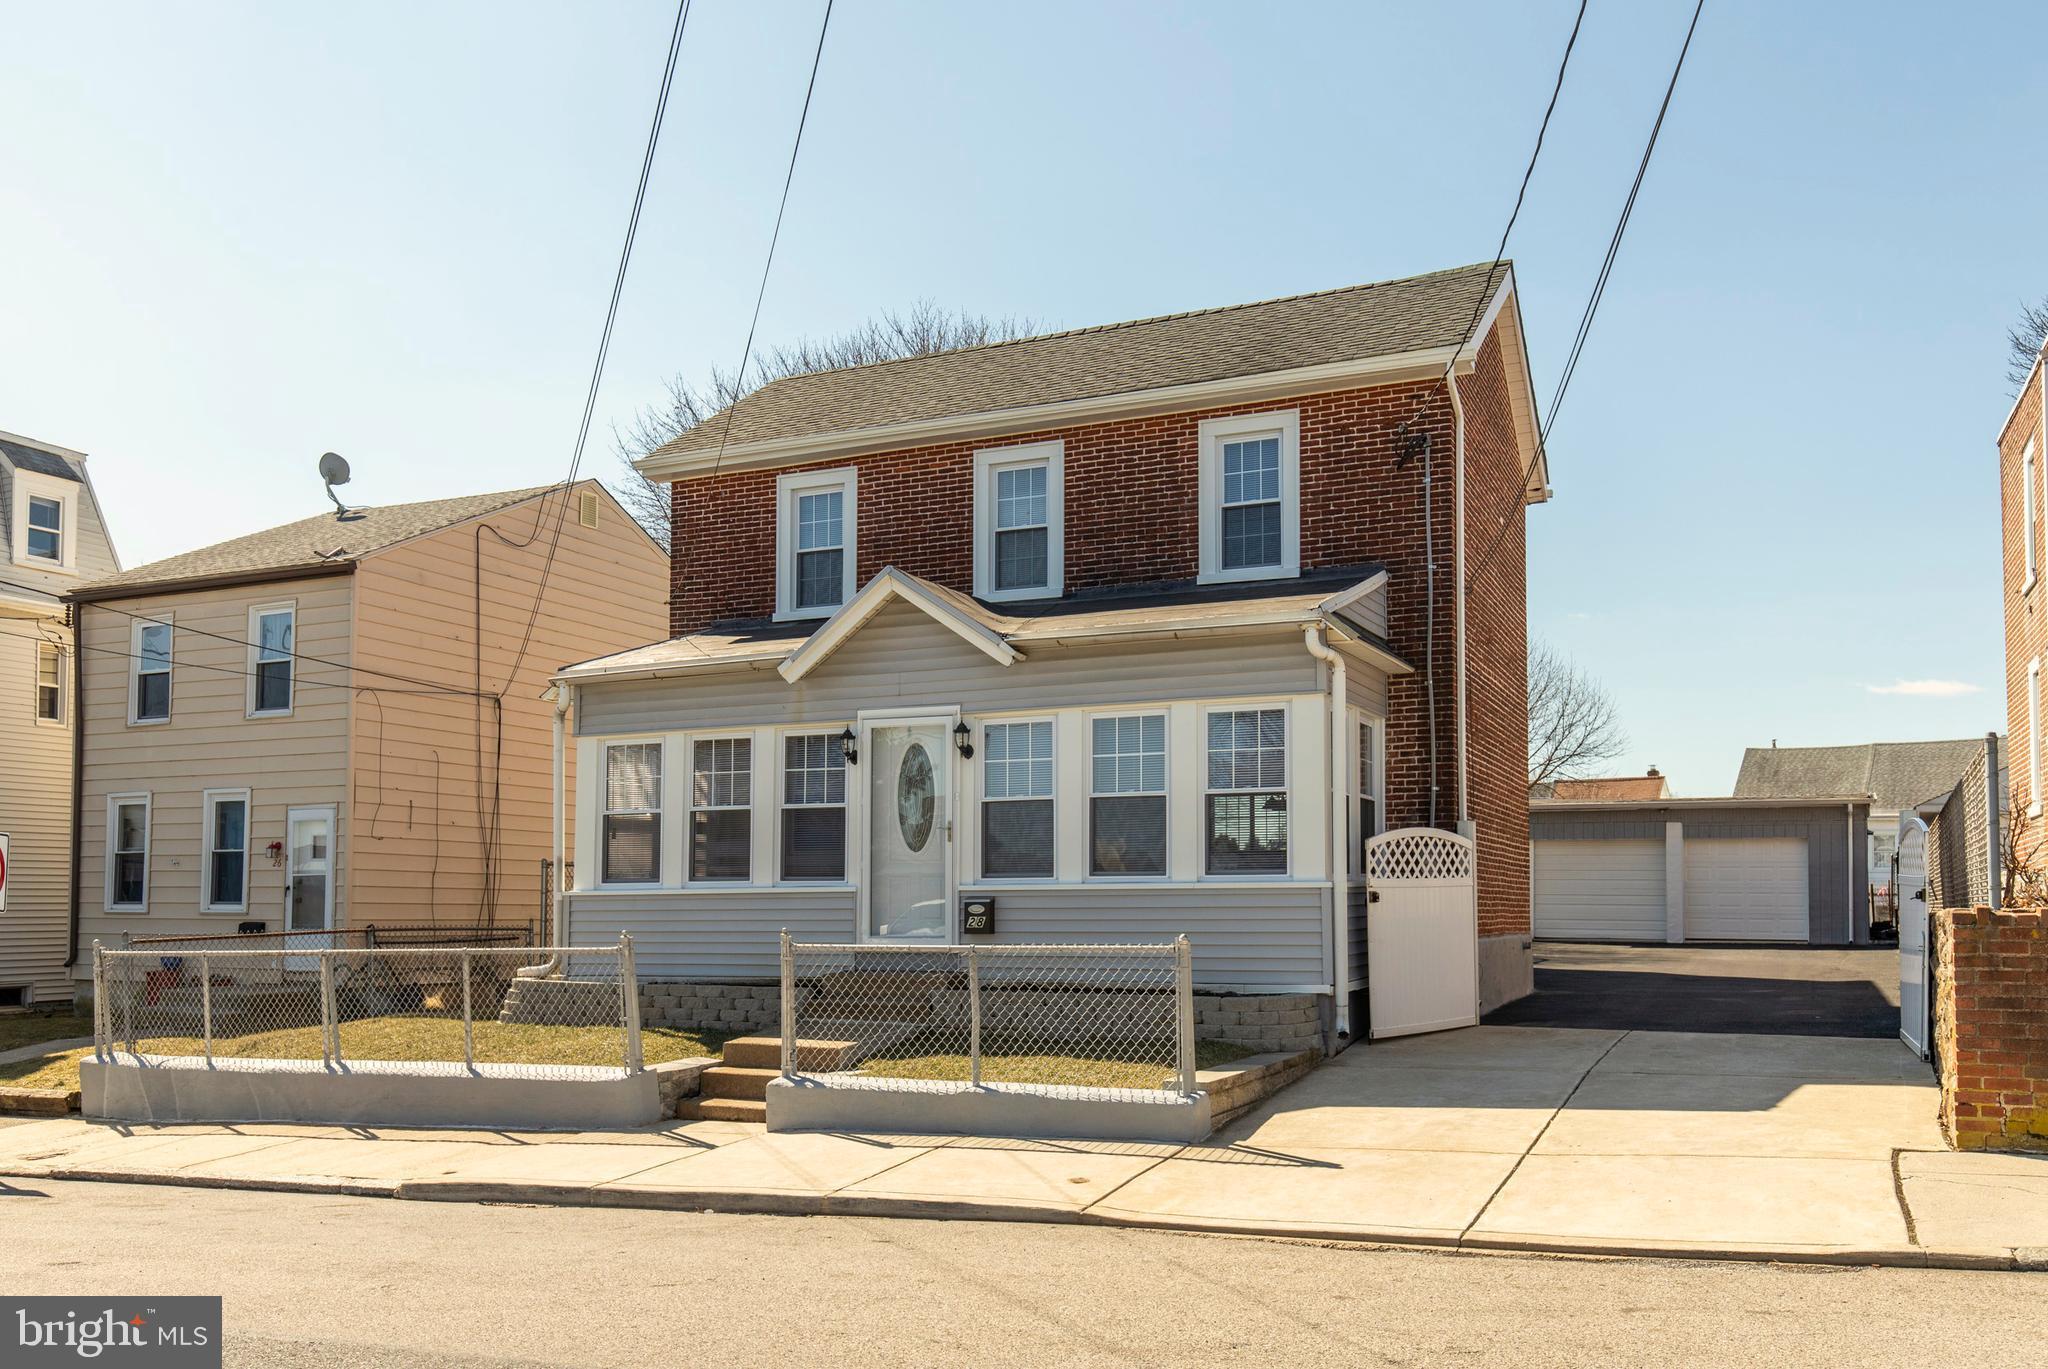 28 N DIAMOND STREET, CLIFTON HEIGHTS, PA 19018